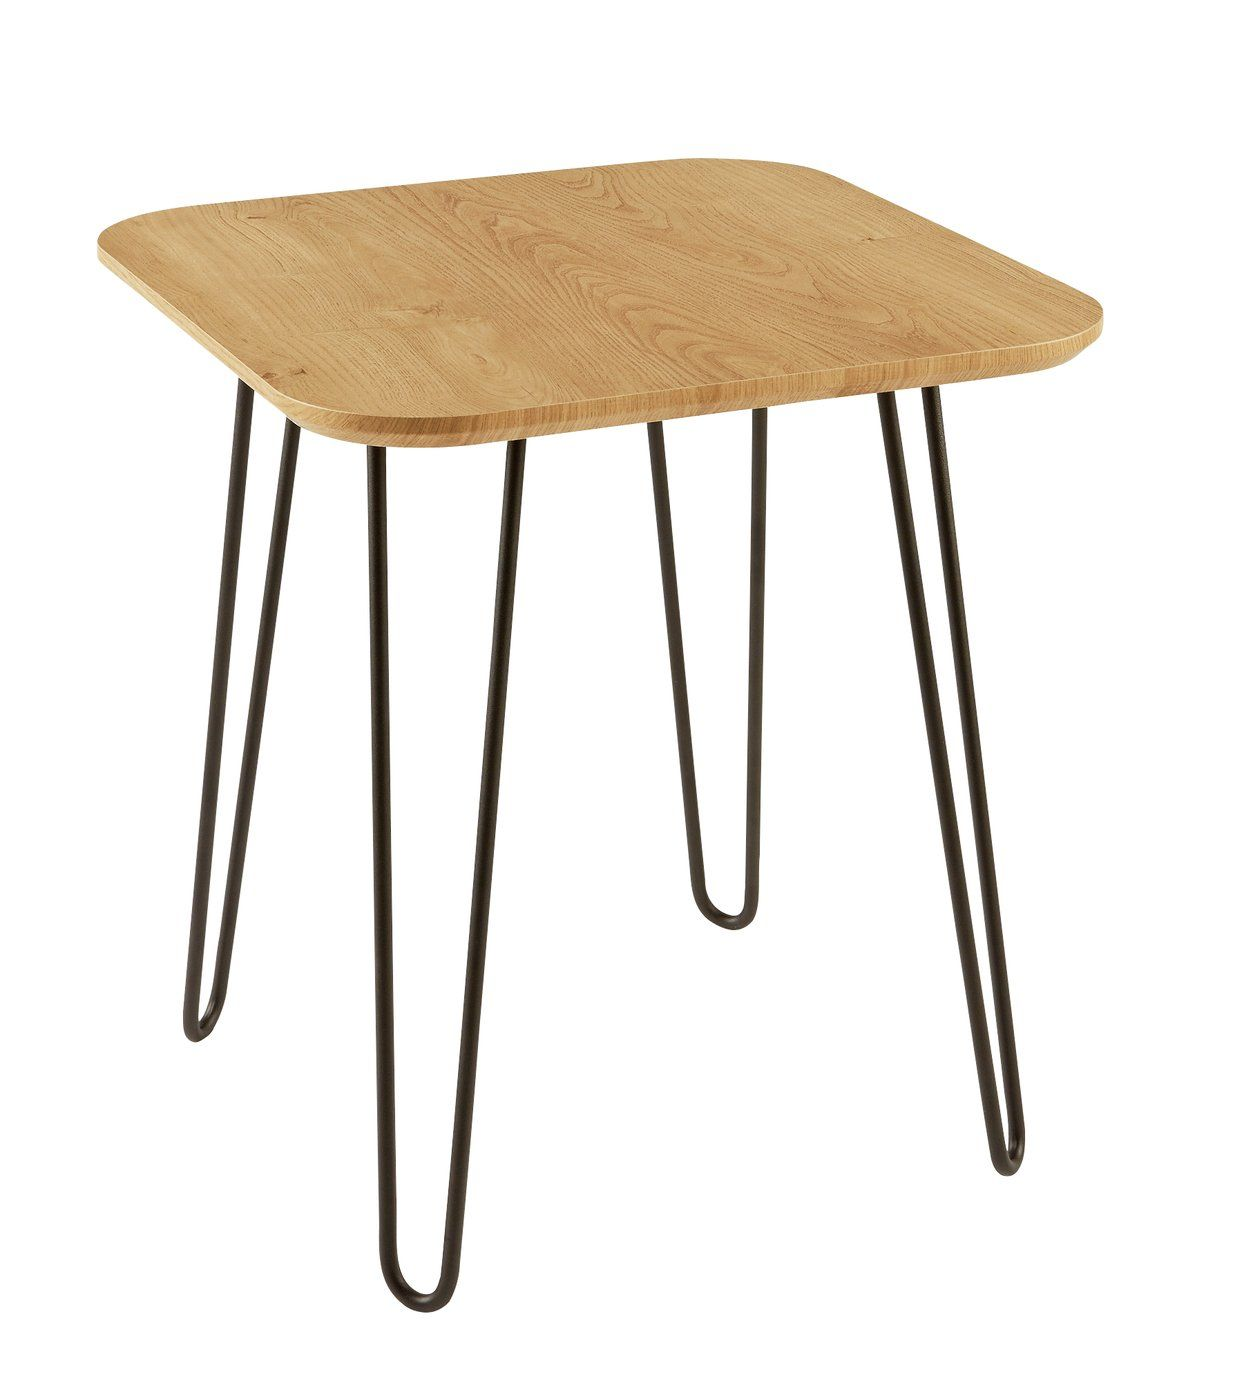 Argos Home Klark Hairpin End Table Light Wood Effect Argos Home End Tables Light Table [ 1381 x 1253 Pixel ]